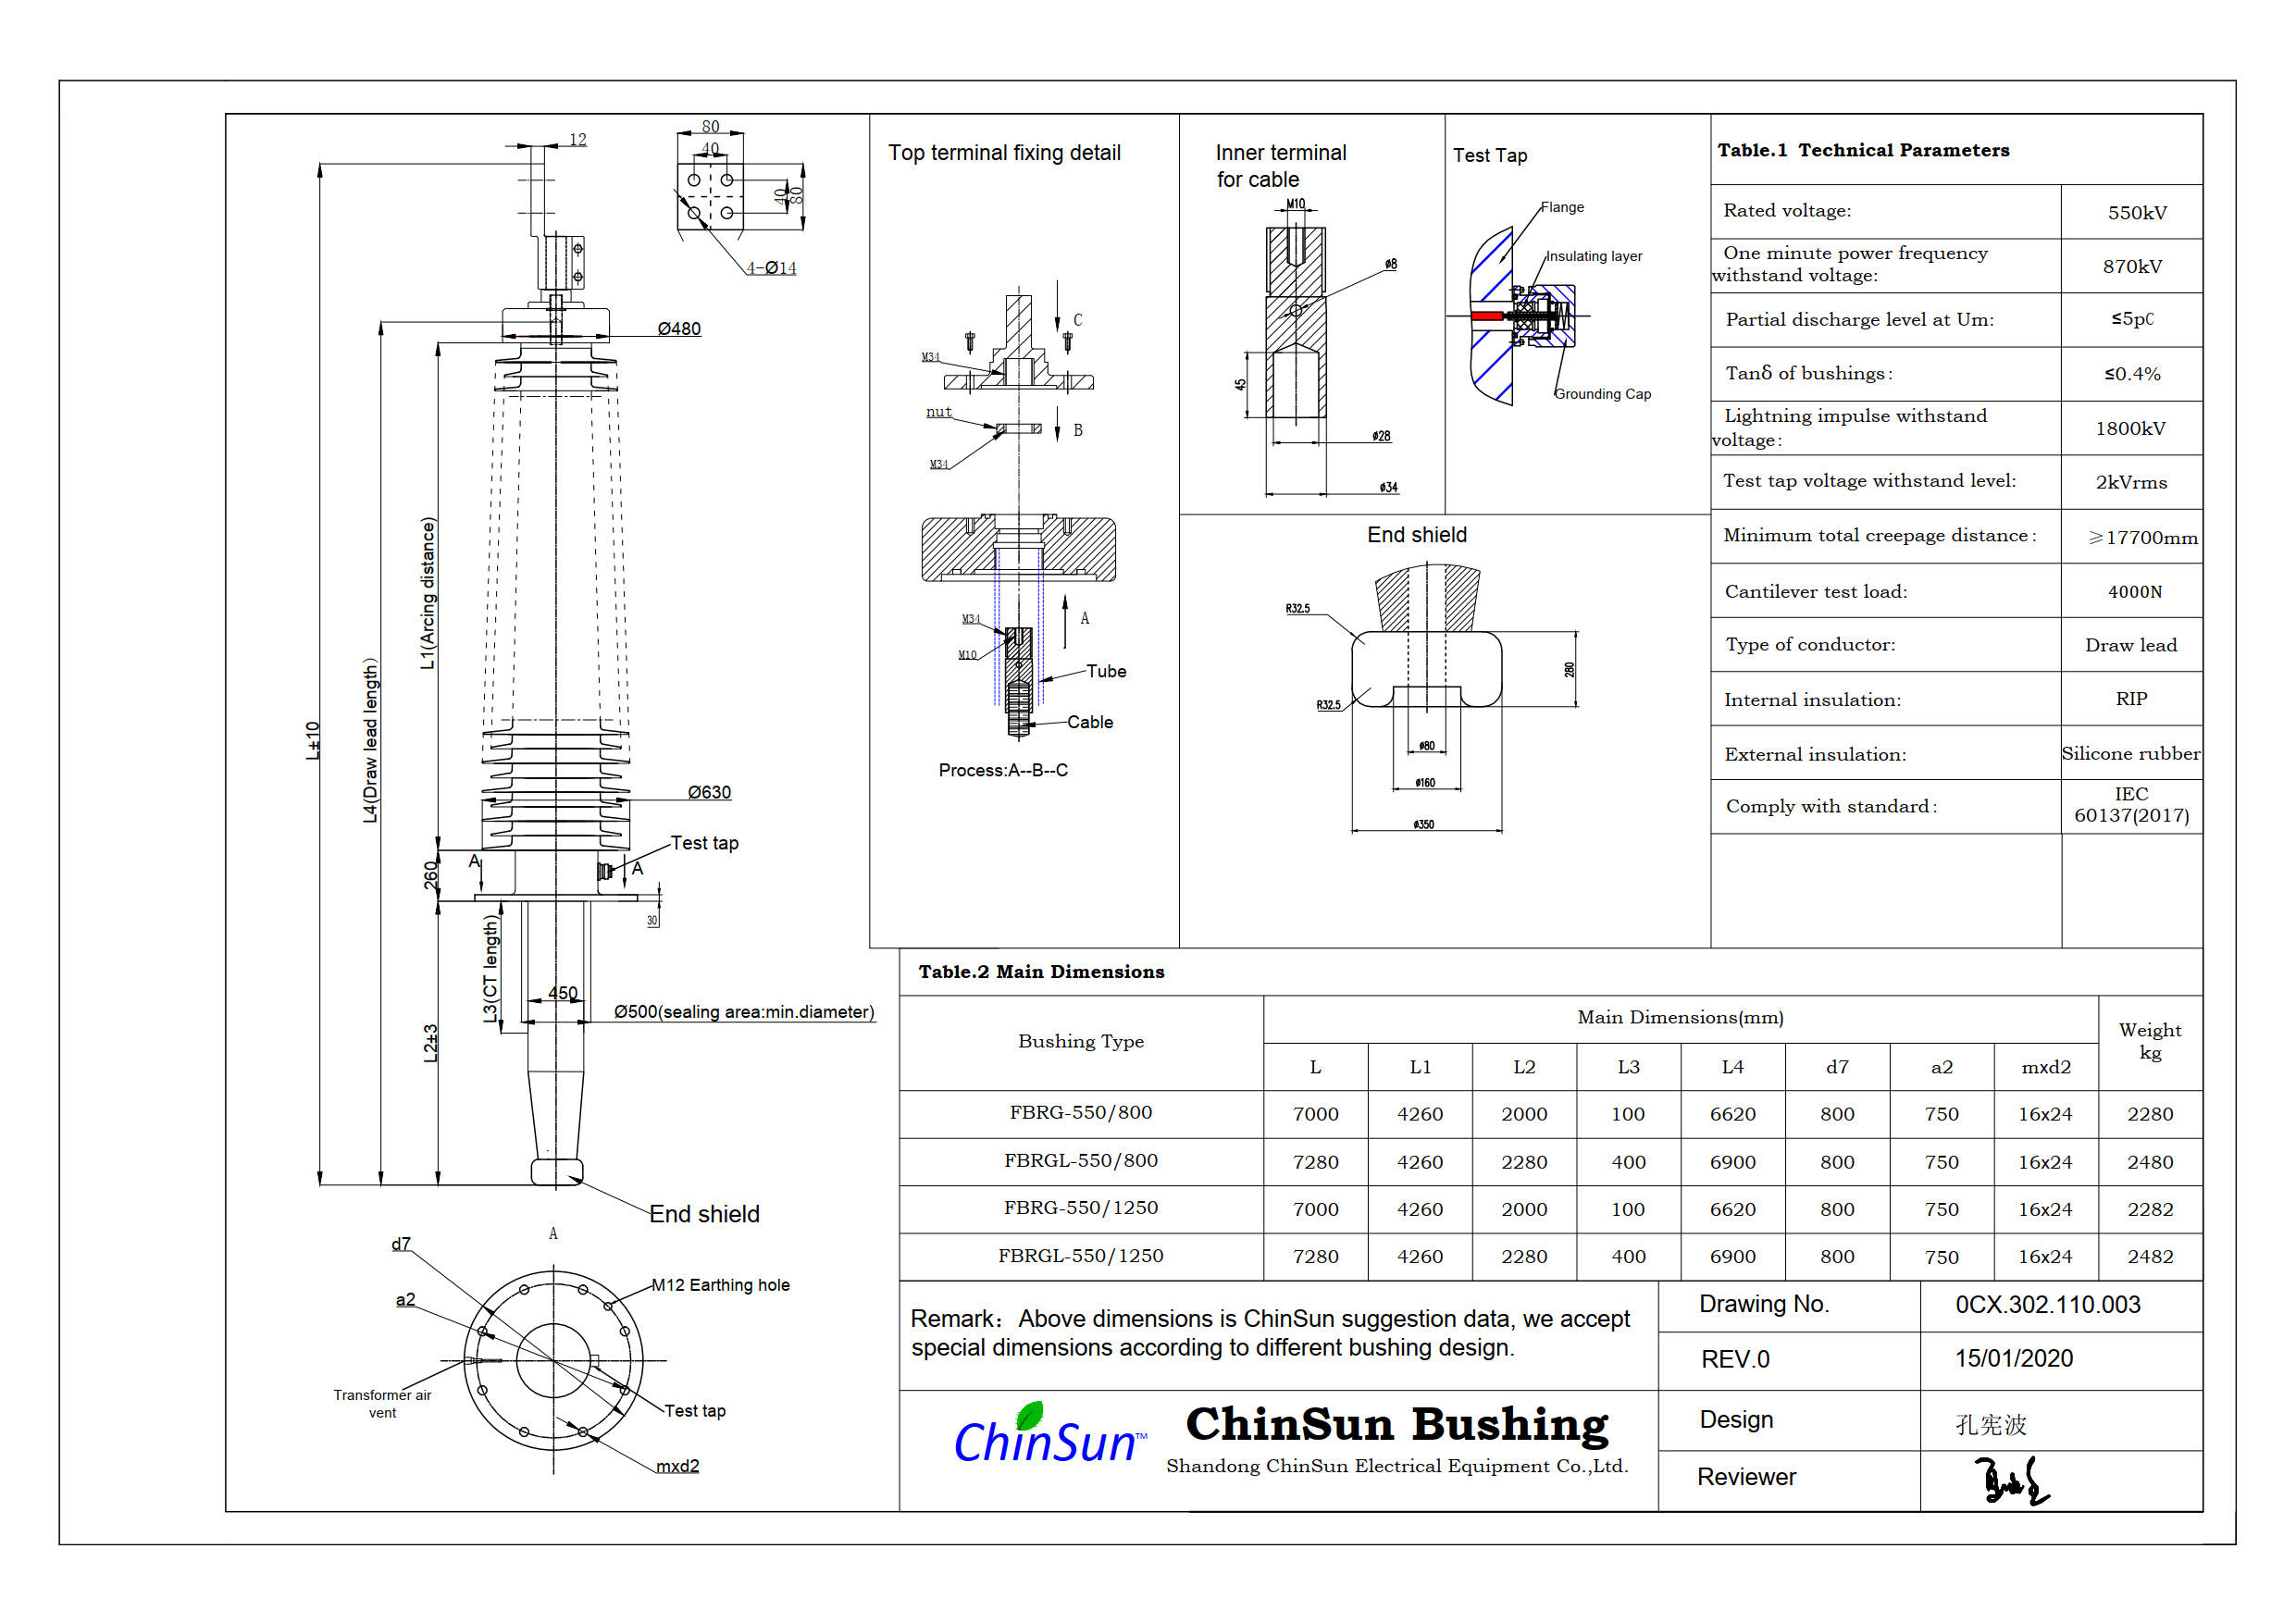 Drawing-transformer bushing-550kV_silicone rubber-DL-ChinSun